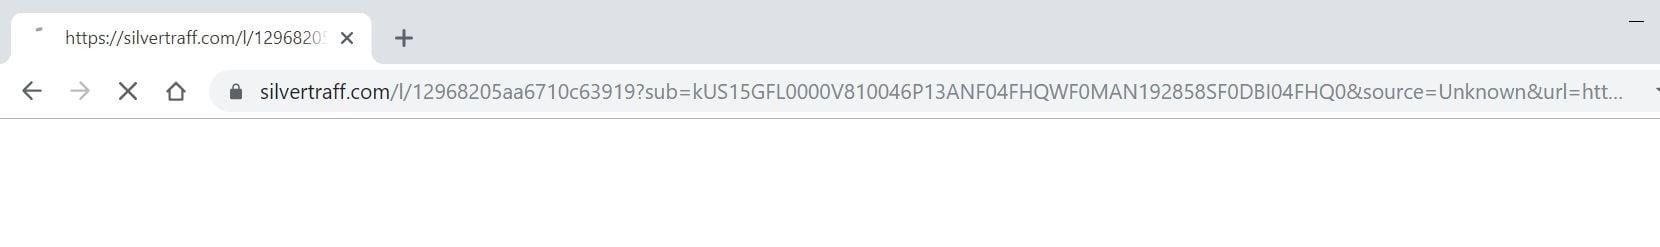 Silvertraff.com redirect virus